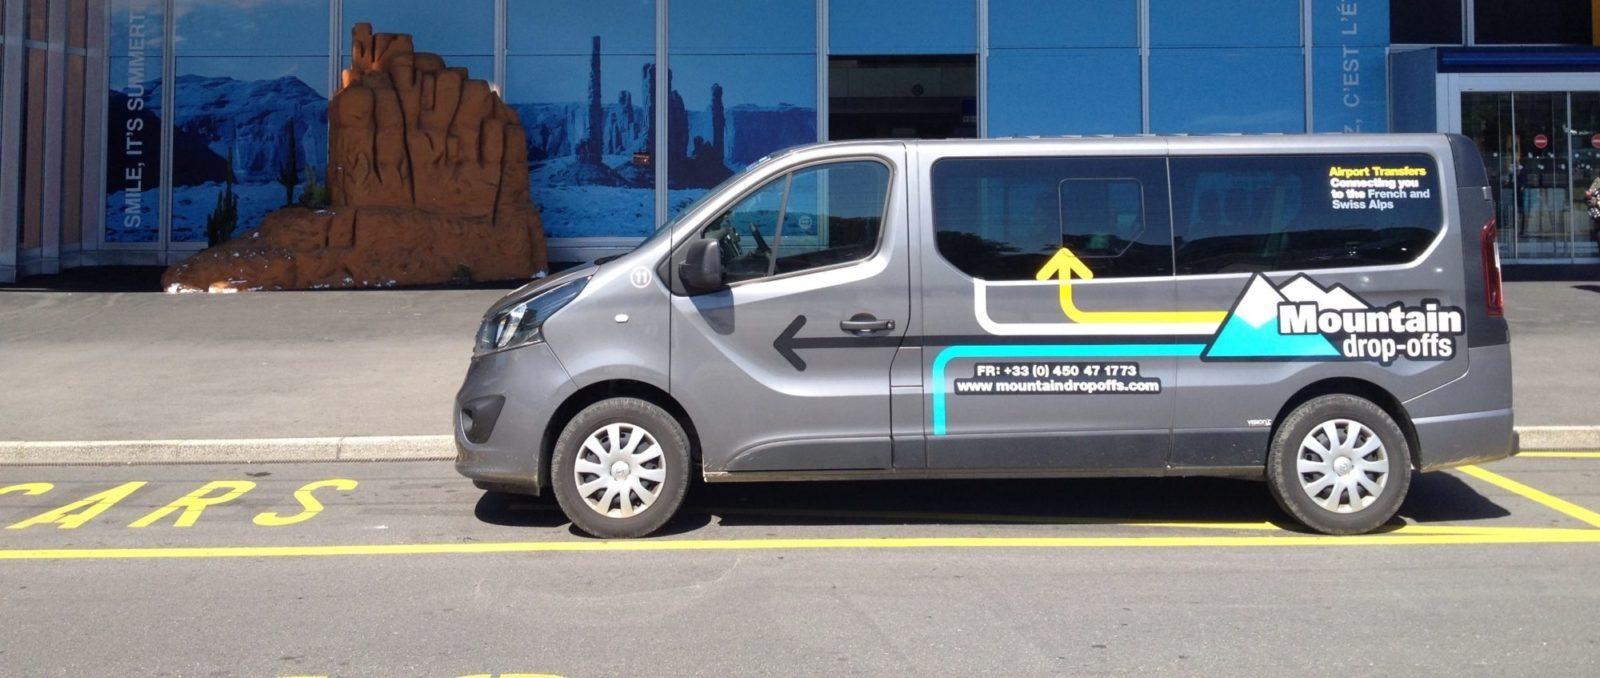 Grey transporter van parked near an airport